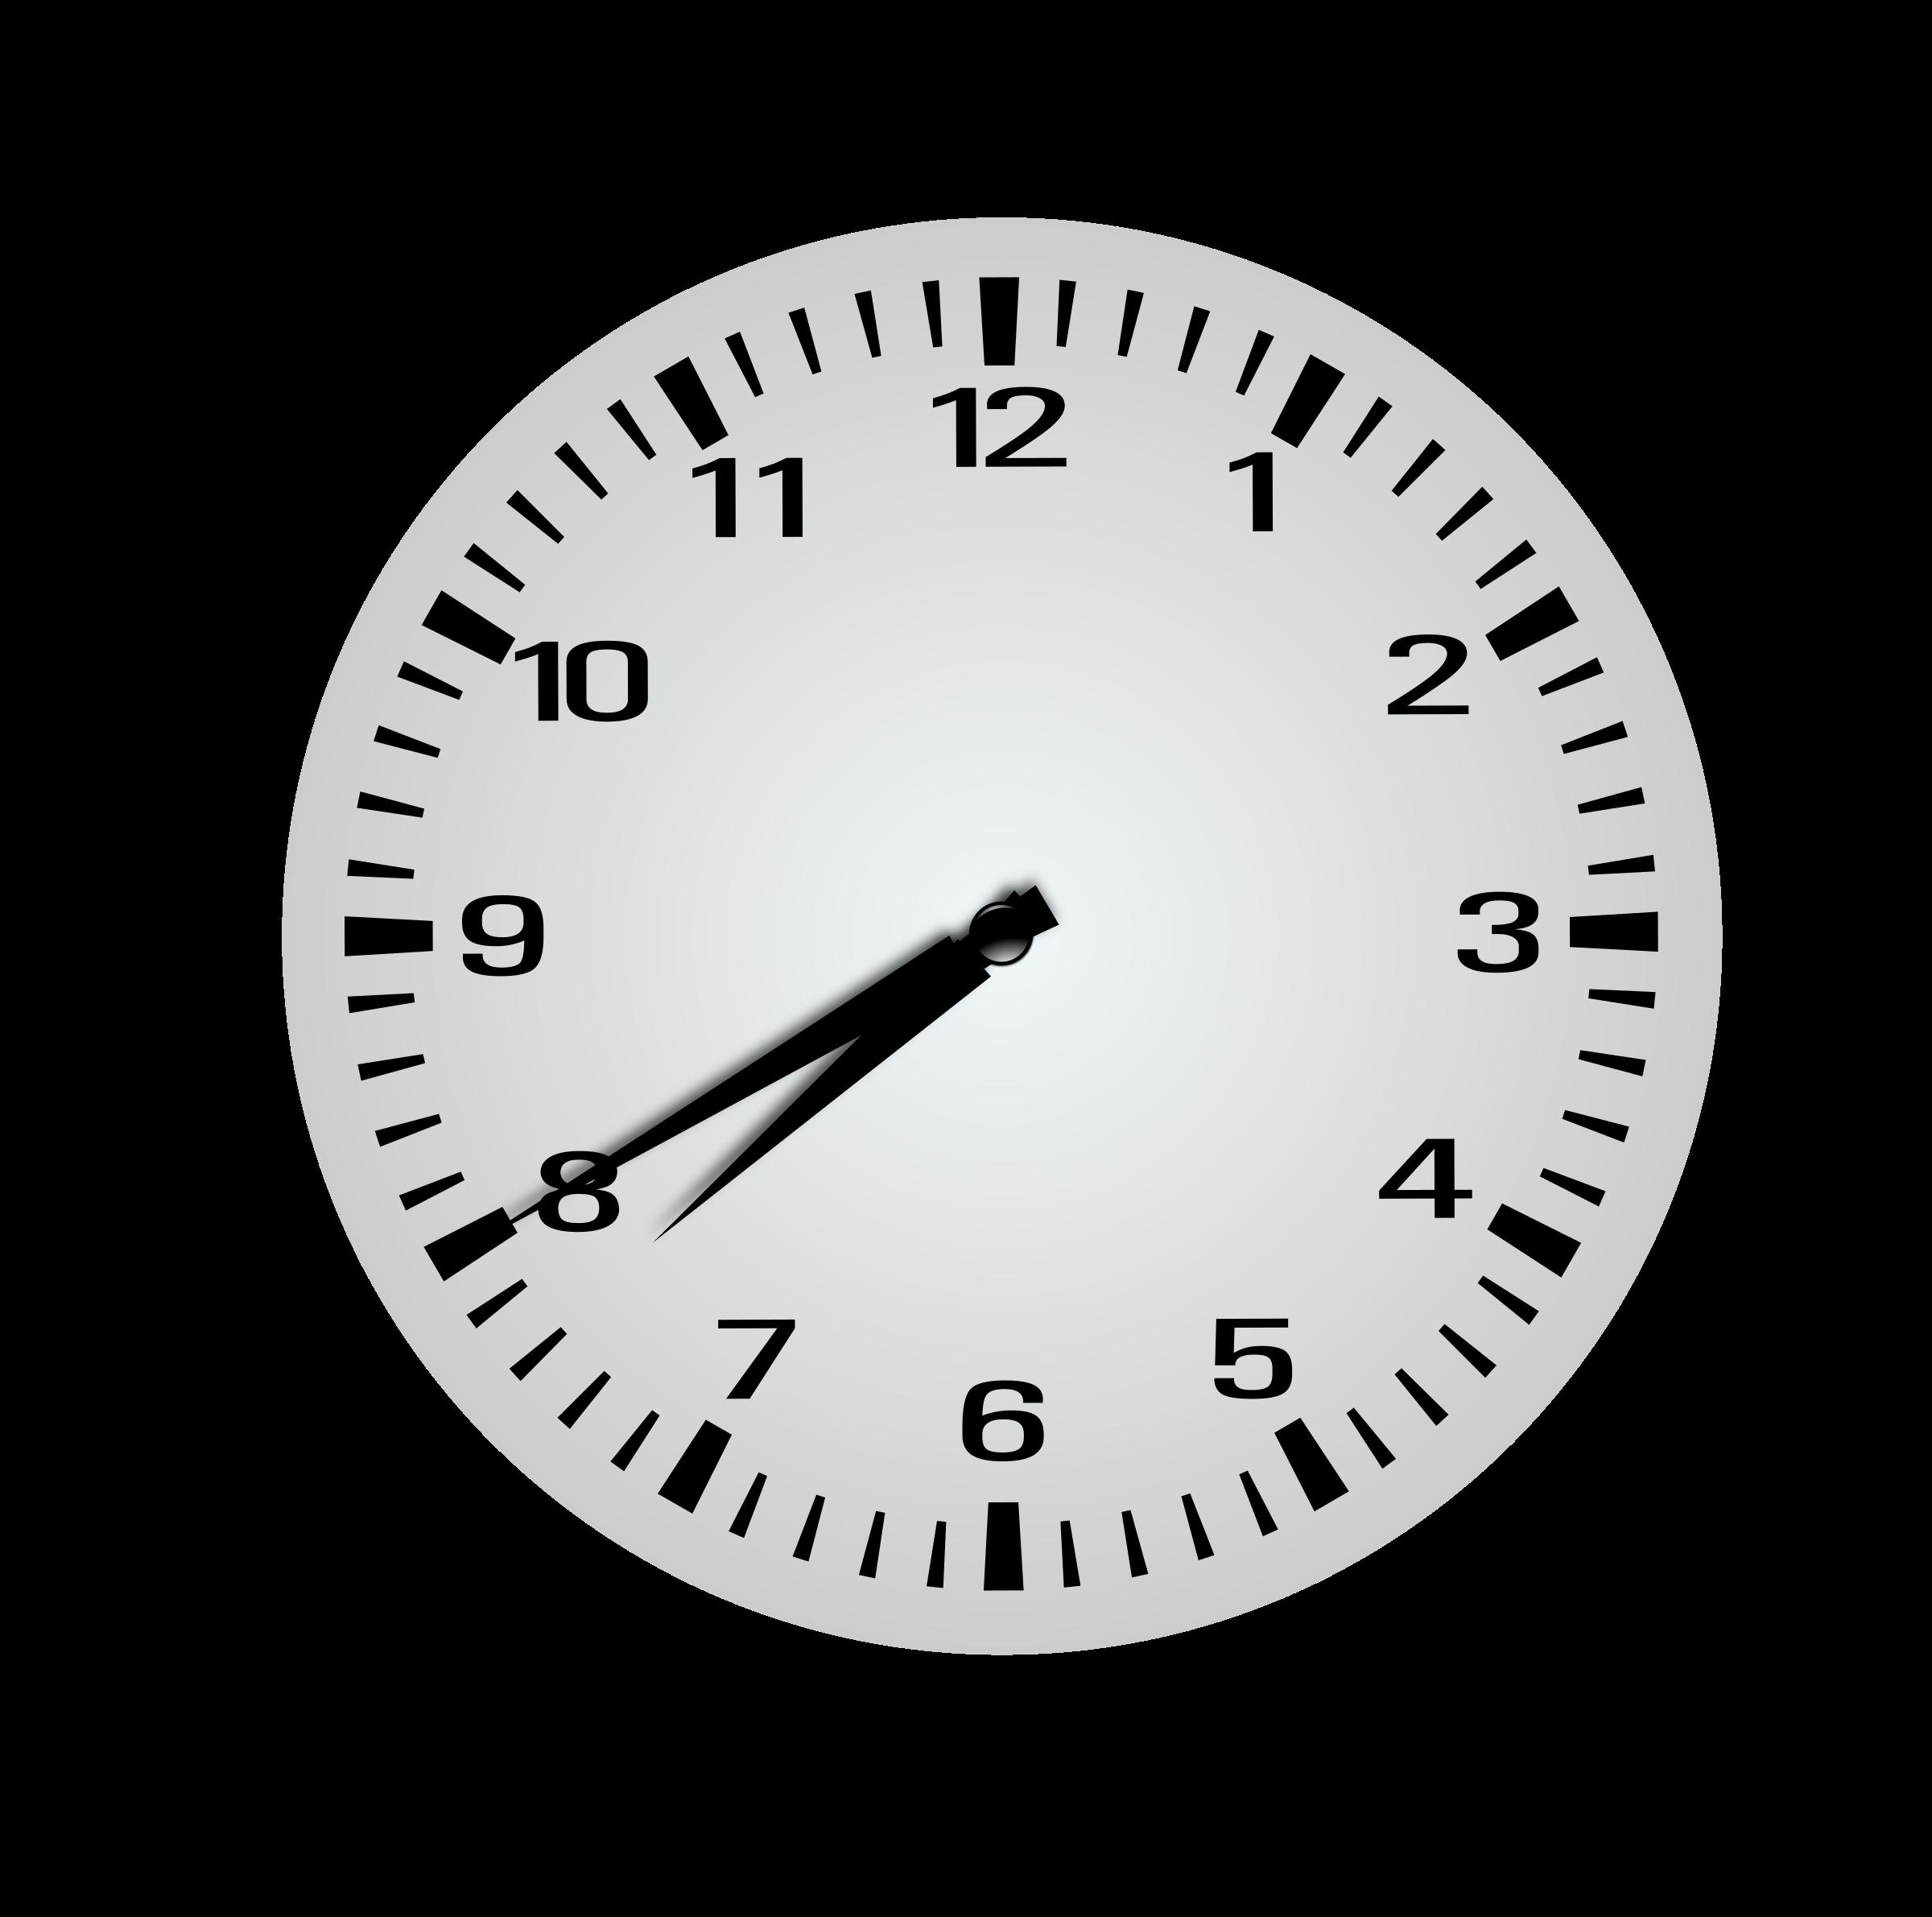 Clock clipart 7 o clock. Twenty minutes before eight